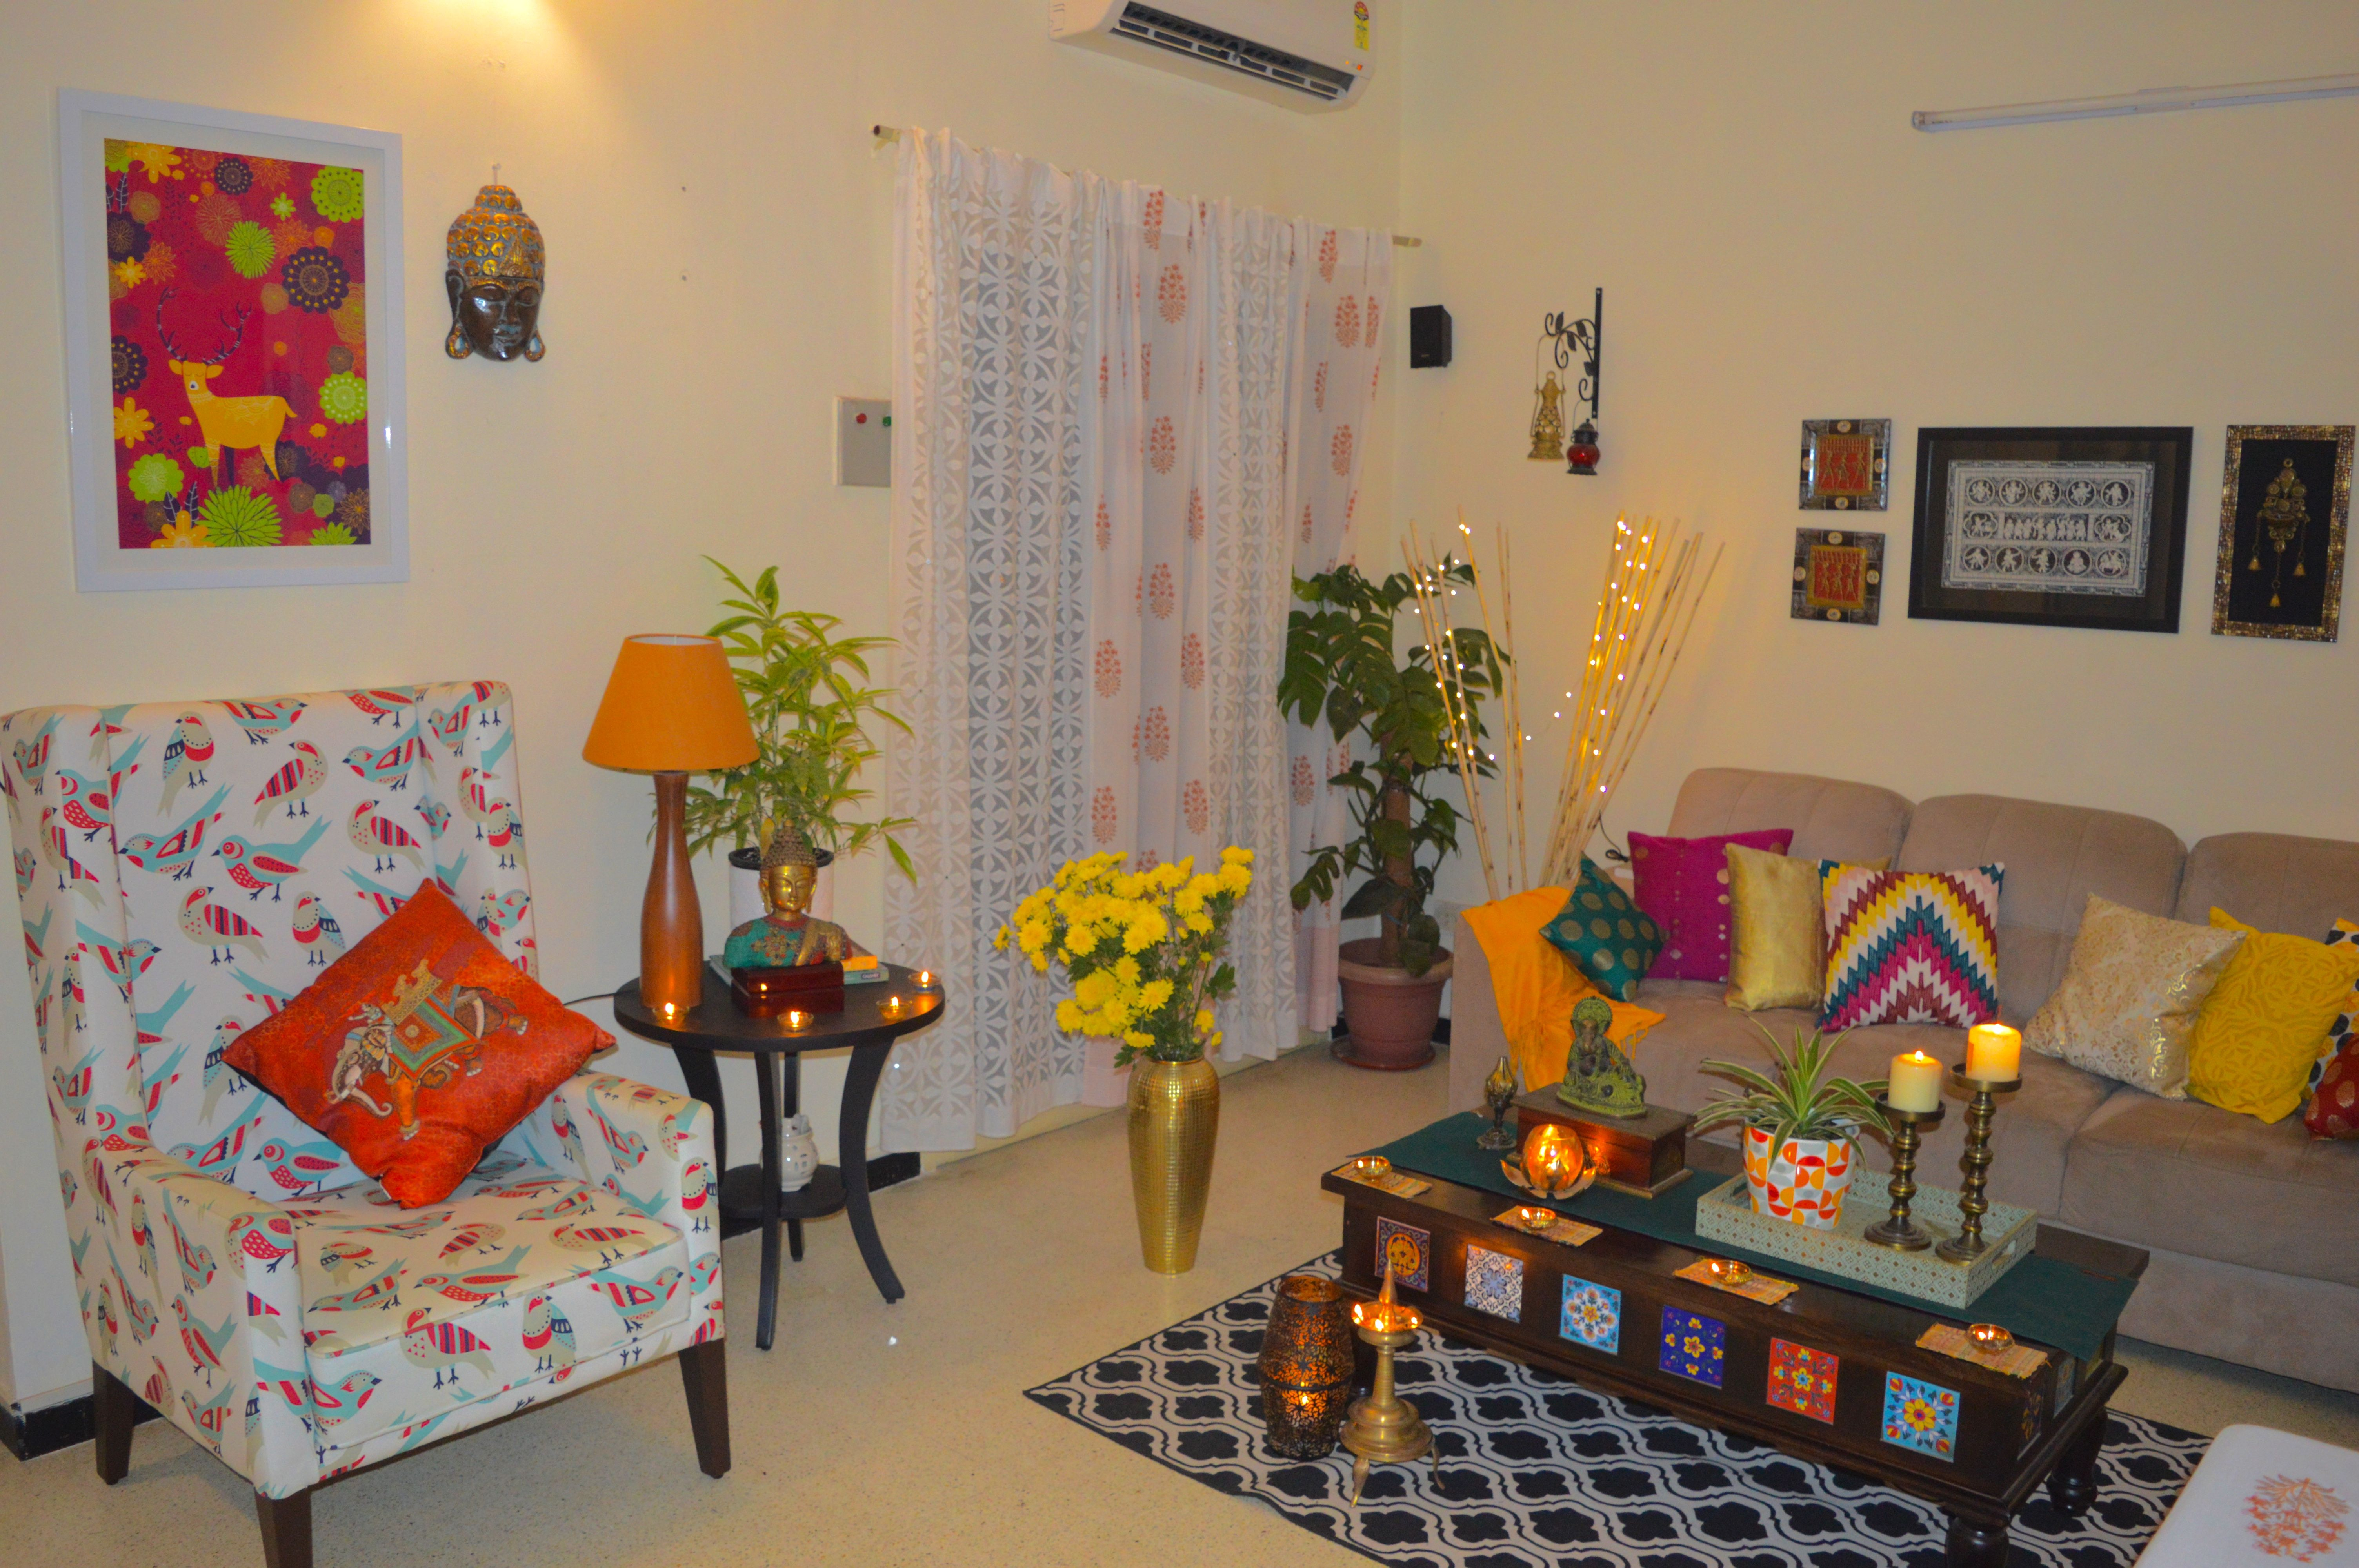 Diwalihomedecor Livingroom Indianhome Livingroomdecor Decoration Coffeetable Cushions Flowers Brass Indiand Indian Decor Small Bedroom Designs Decor